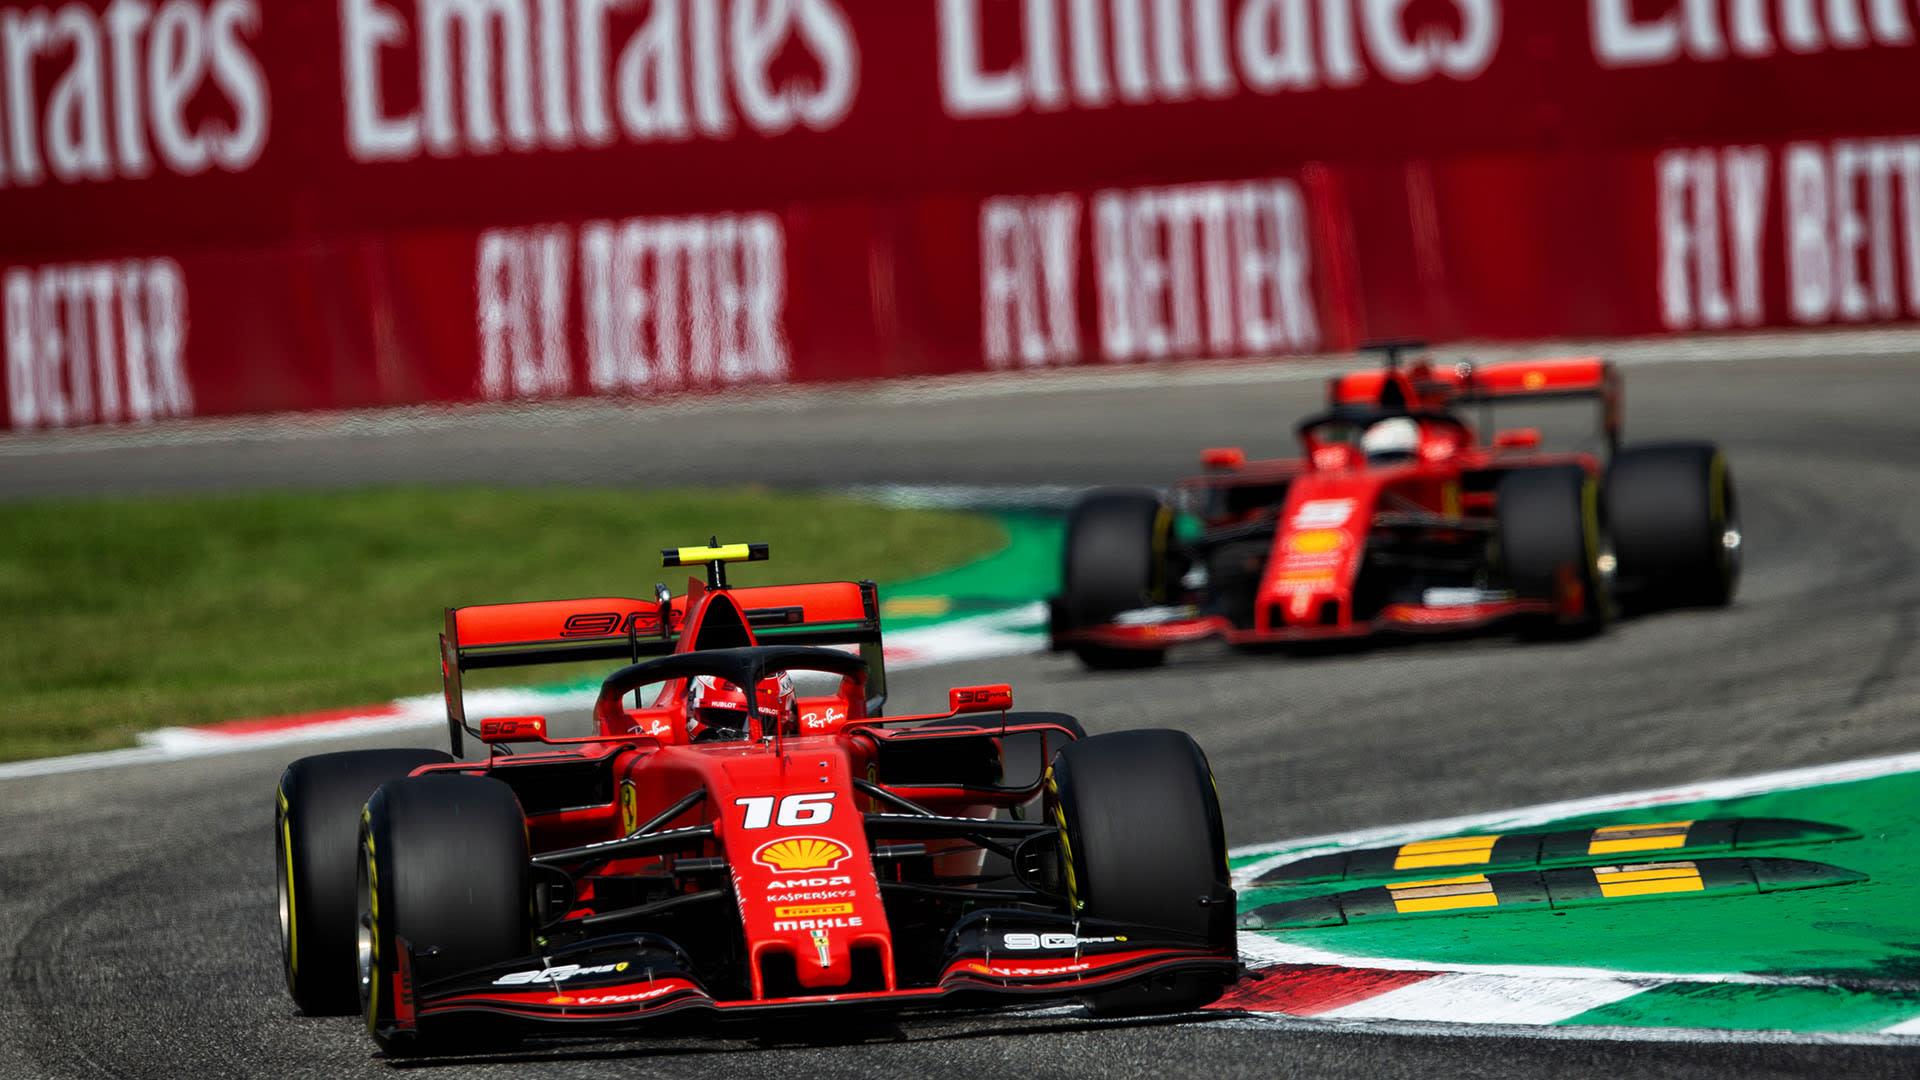 Ferrari Did Not Stick To Monza Qualifying Gameplan Says